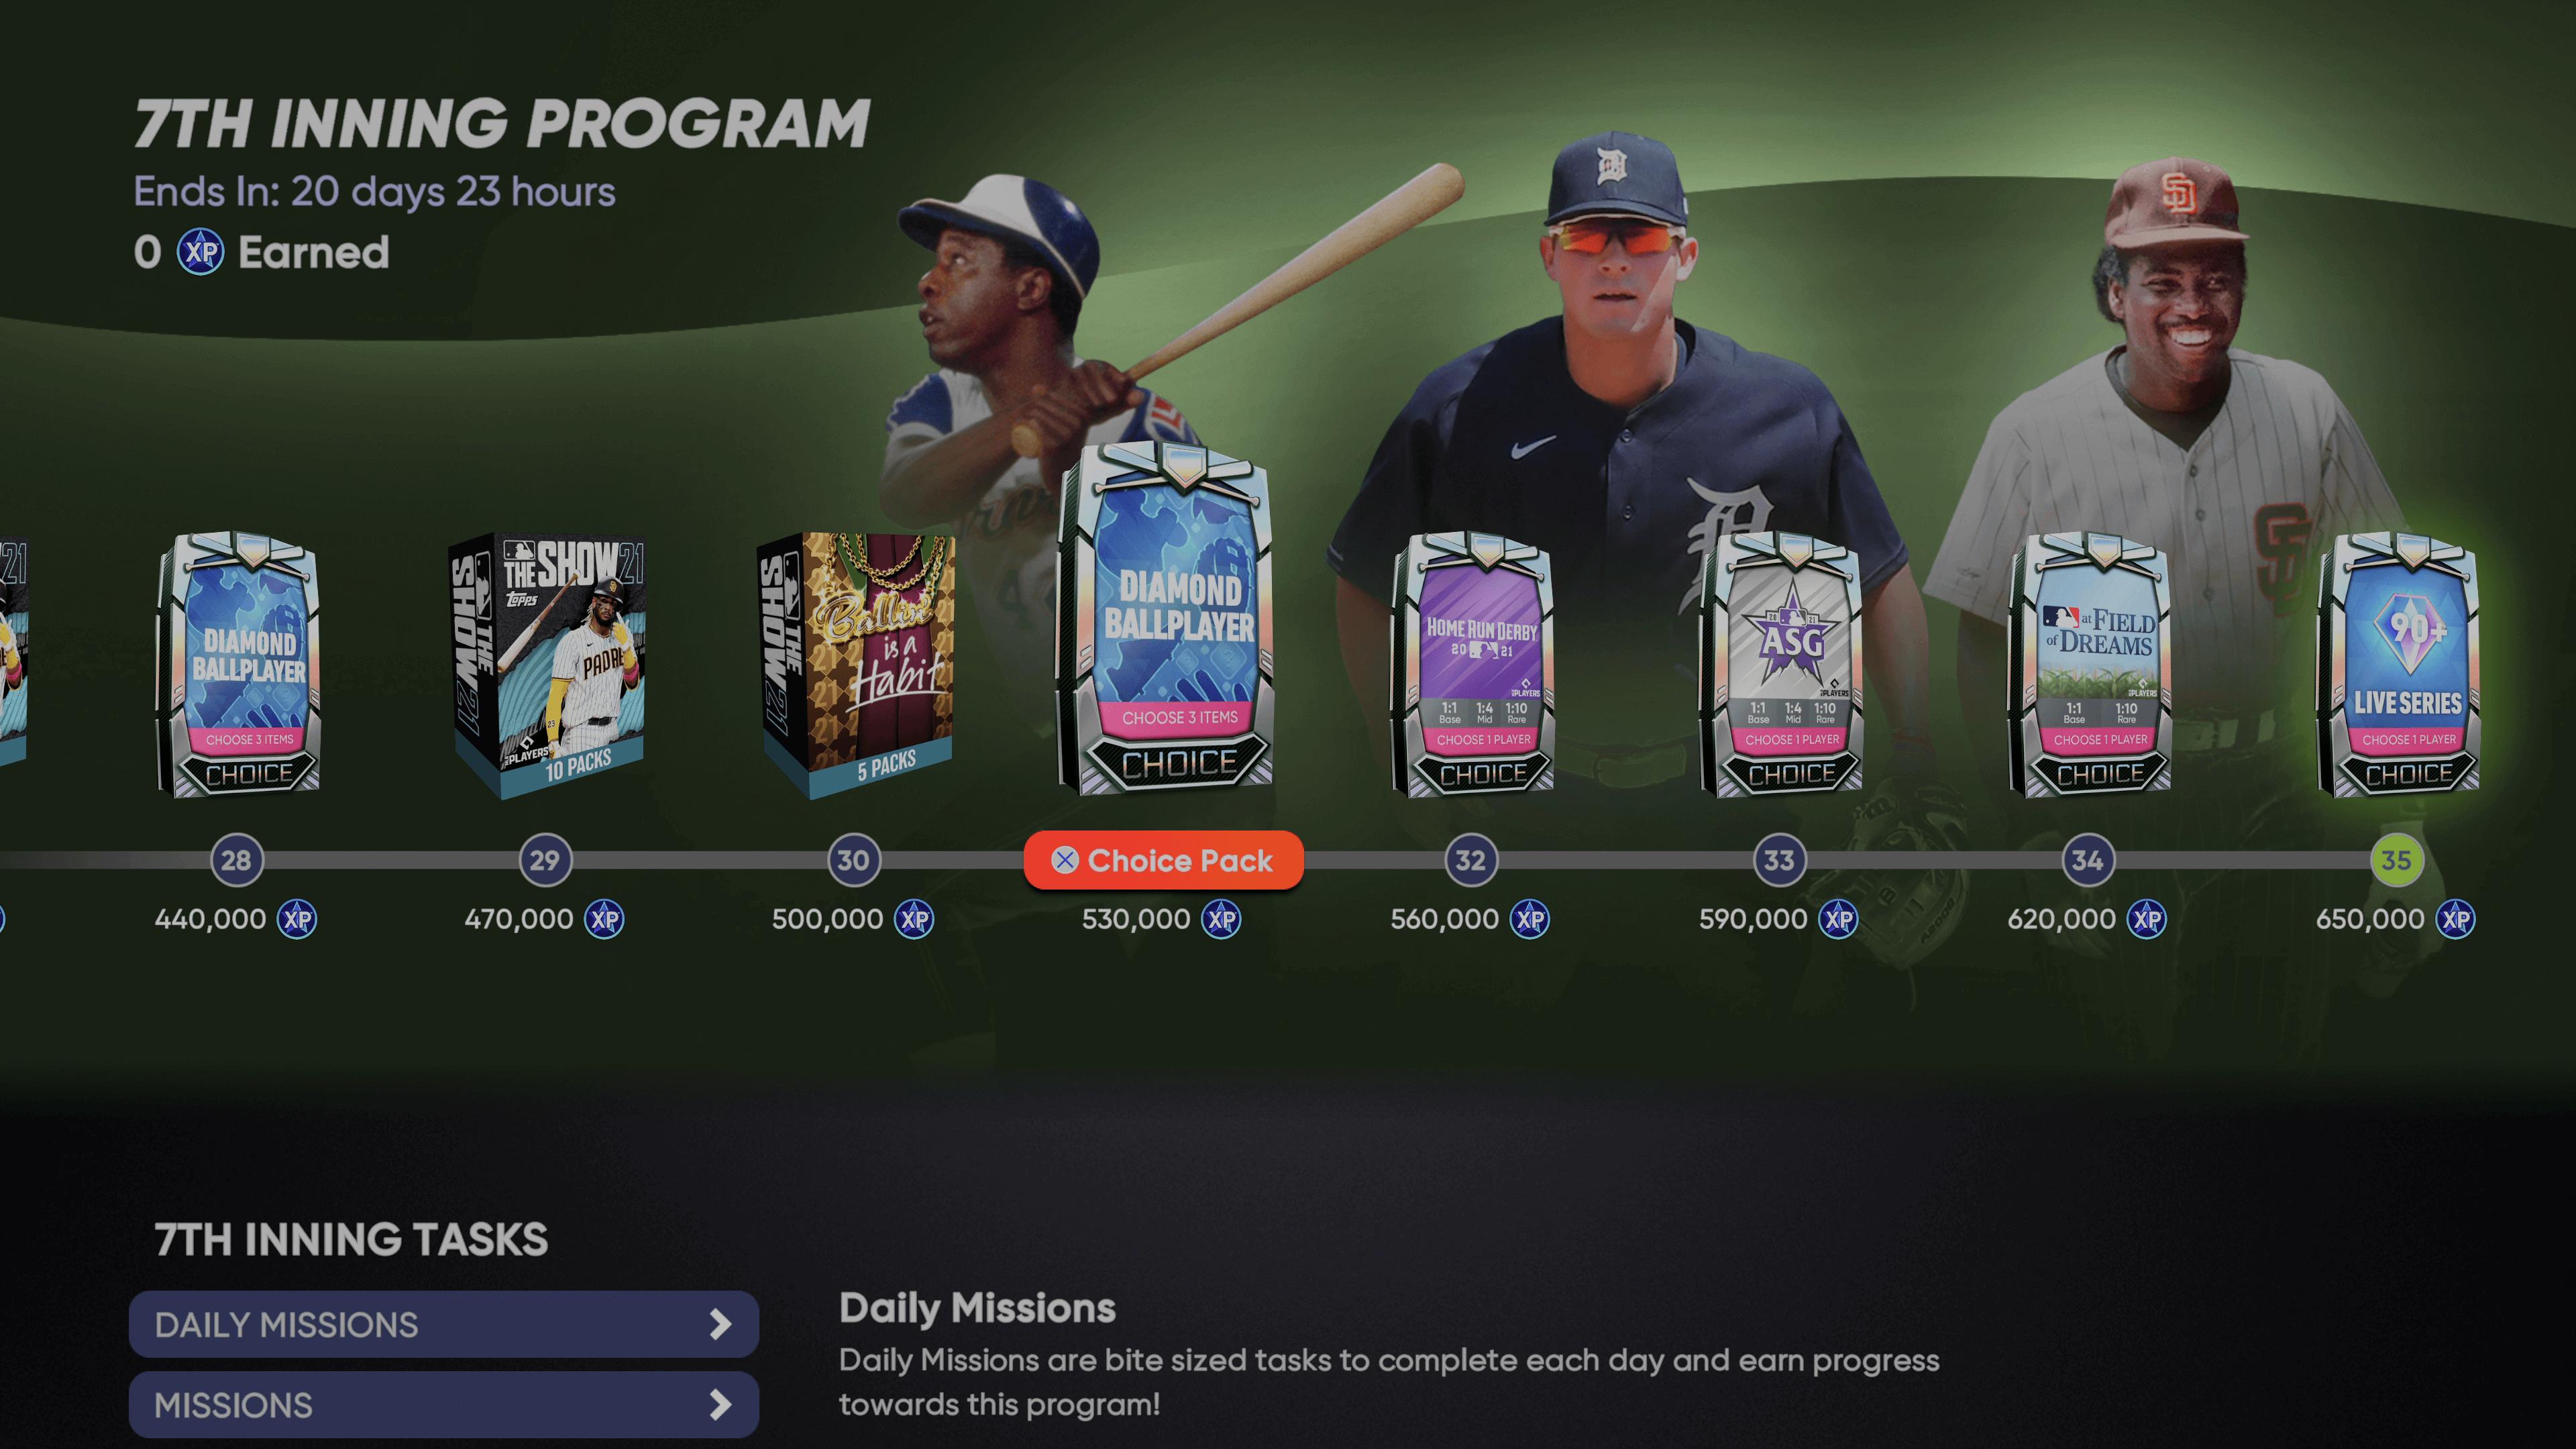 MLB The Show 21 - 7th Inning Program_2021-09-24_15-07-41